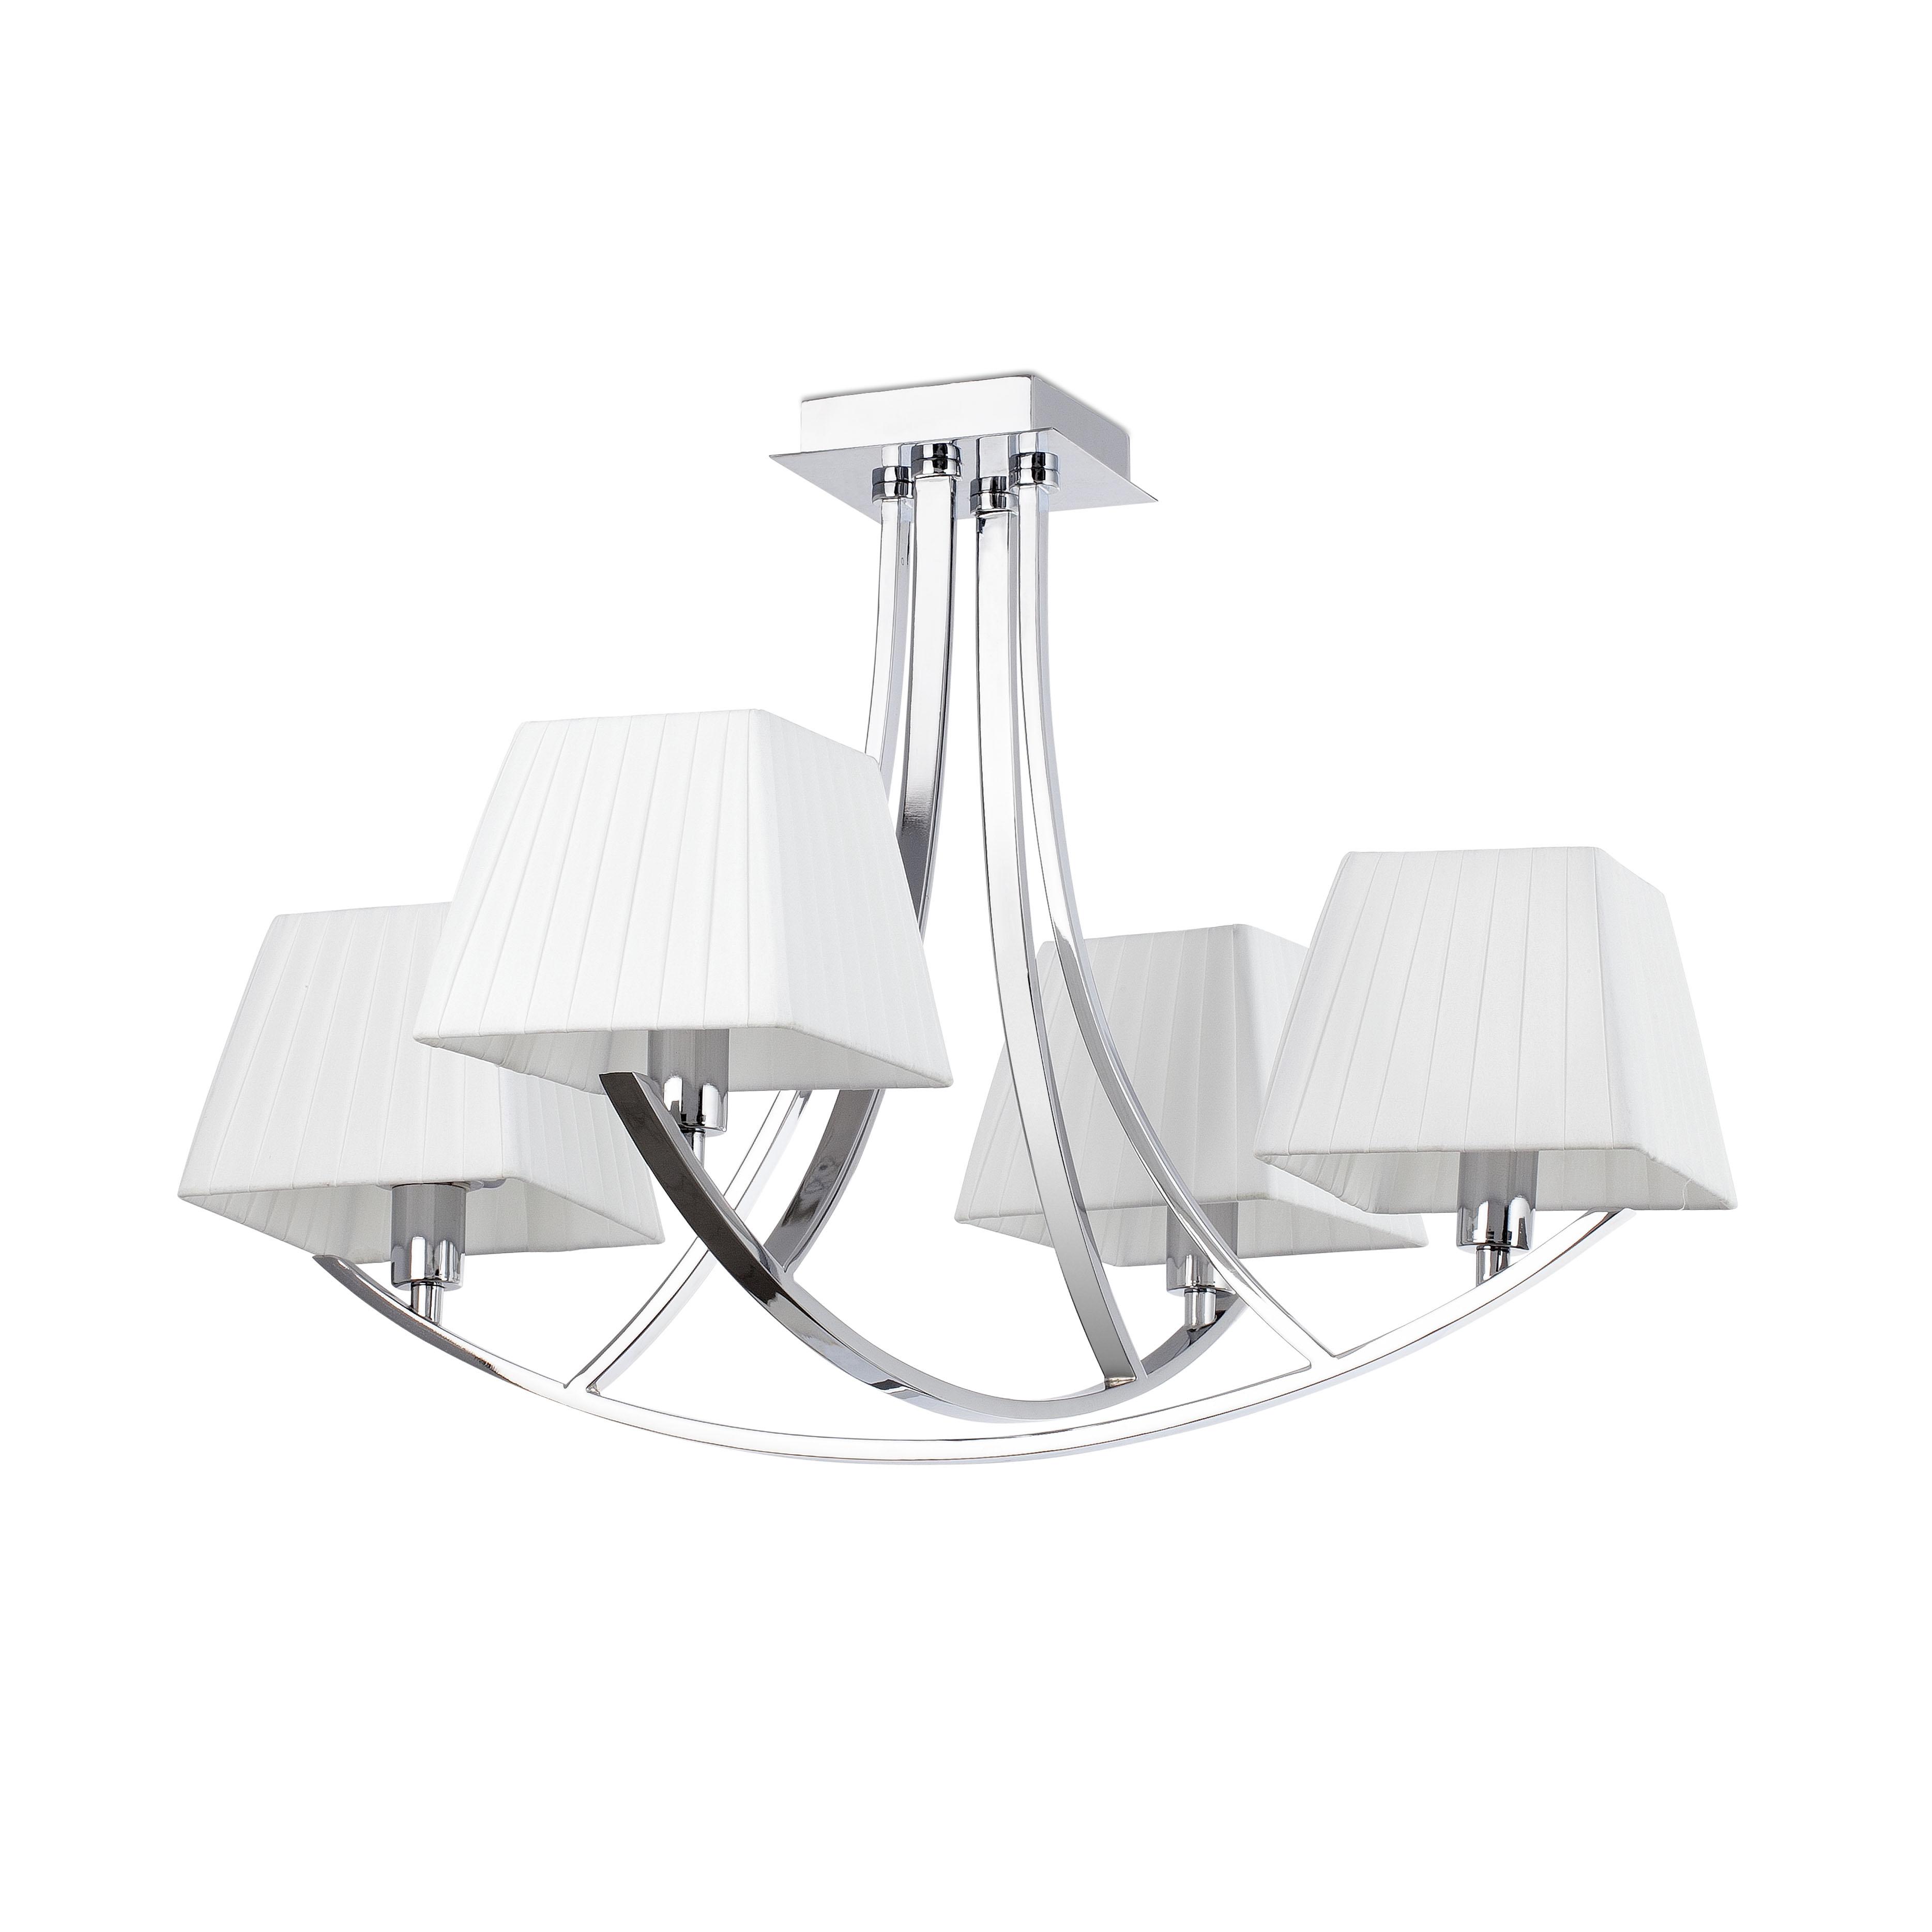 Rio hanglamp chroom 4L